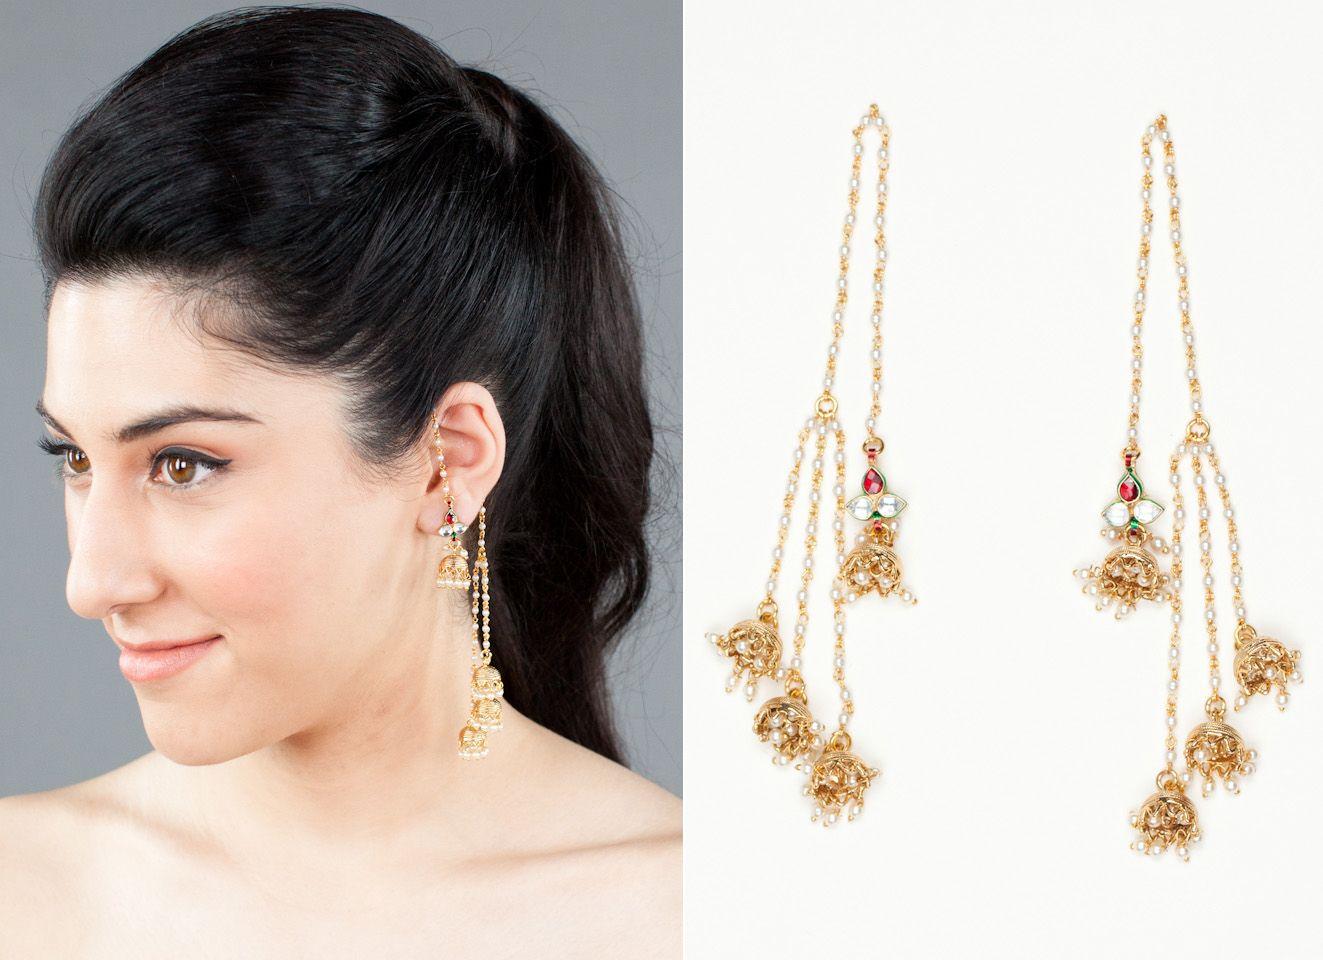 Earring Trends  Other Wrap Earrings, These Tiny Pearl Kashmiri Style  Earrings